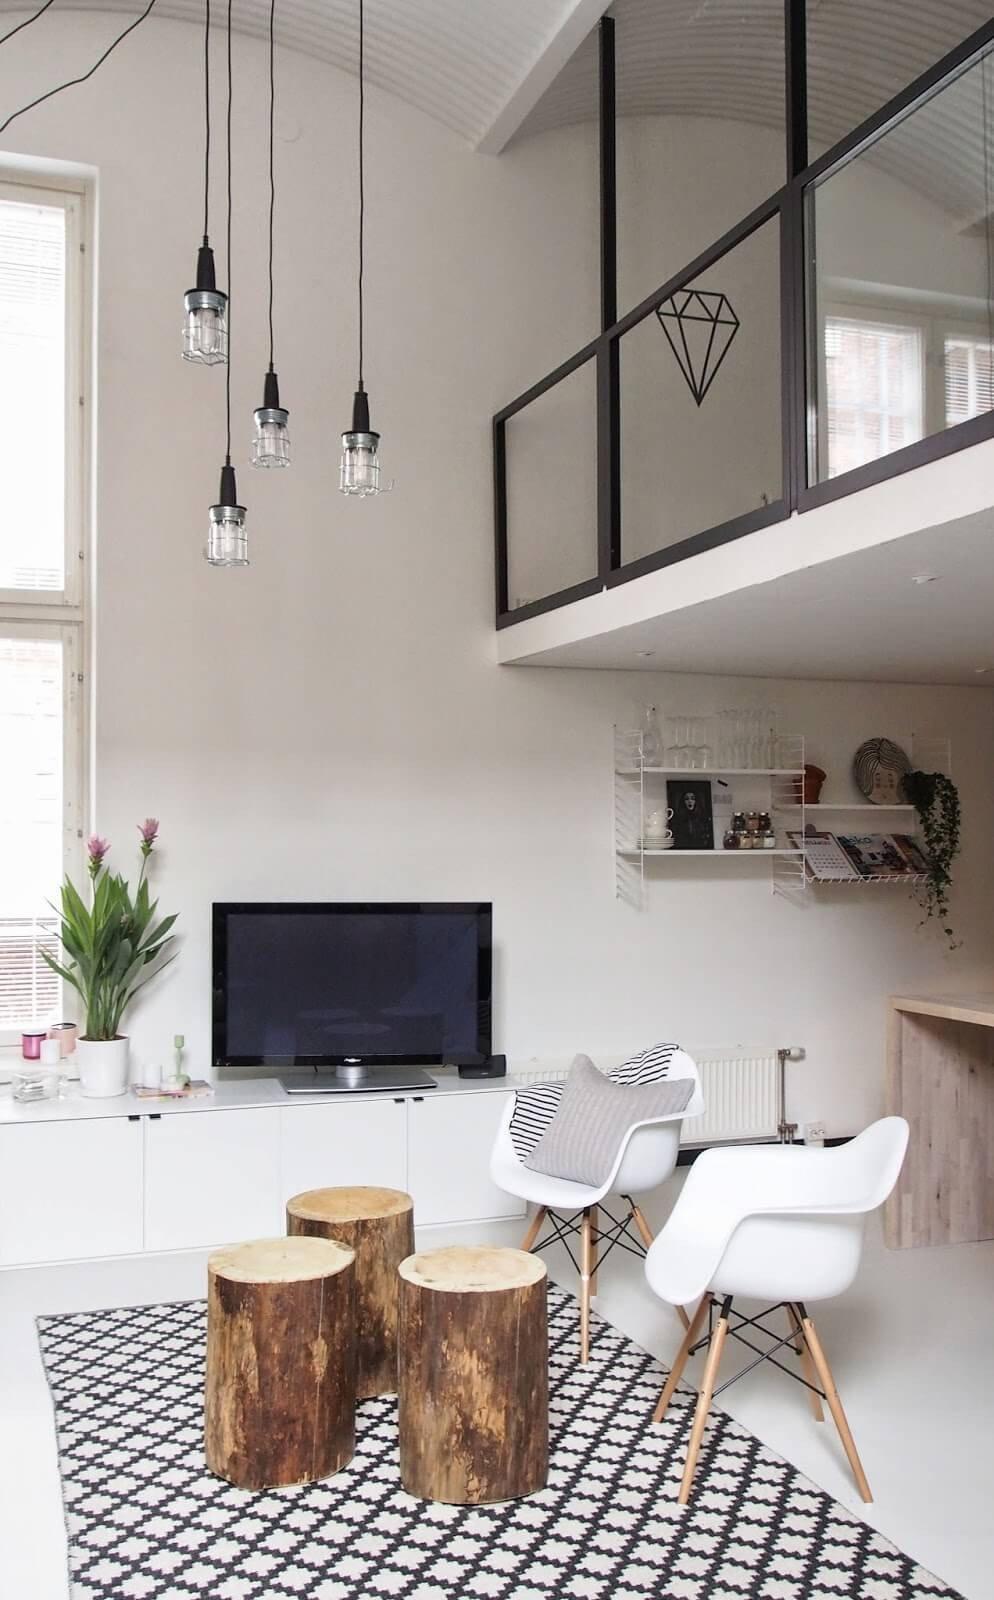 Stylish Living Room Decorating Ideas New 26 Best Modern Living Room Decorating Ideas and Designs for 2019